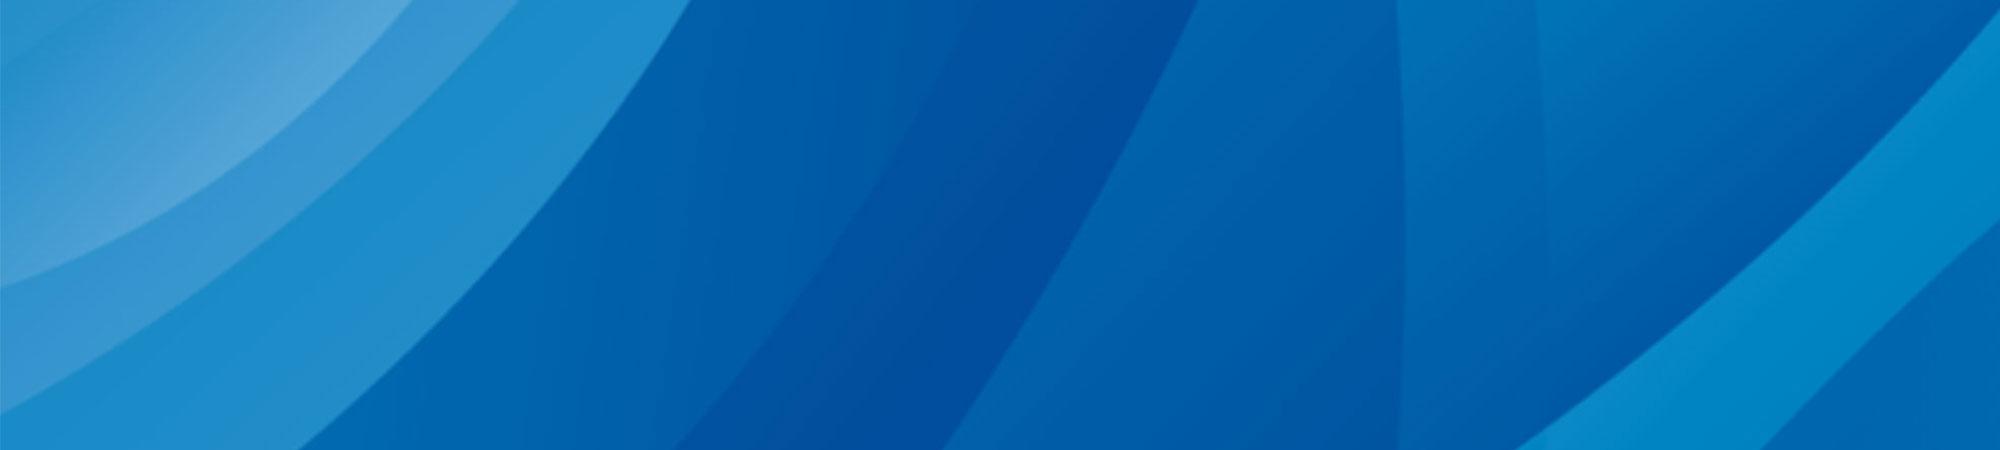 slider-blu